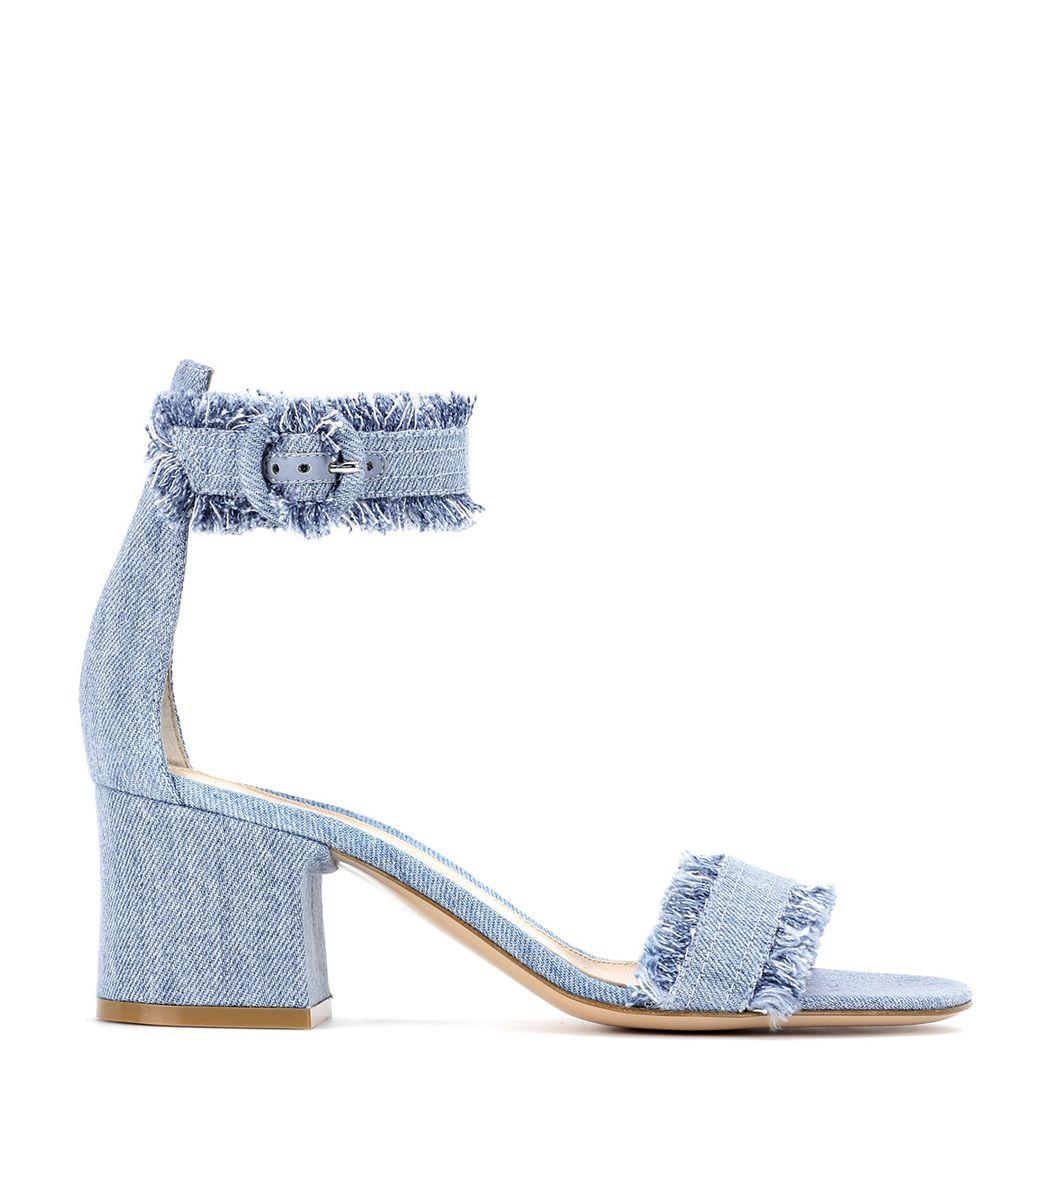 Gianvito Rossi Kiki Frayed Denim Ankle Strap Block Heel Sandals In Stone Wash Modesens Ankle Strap Block Heel Ankle Strap Sandals Heels Block Heels Sandal